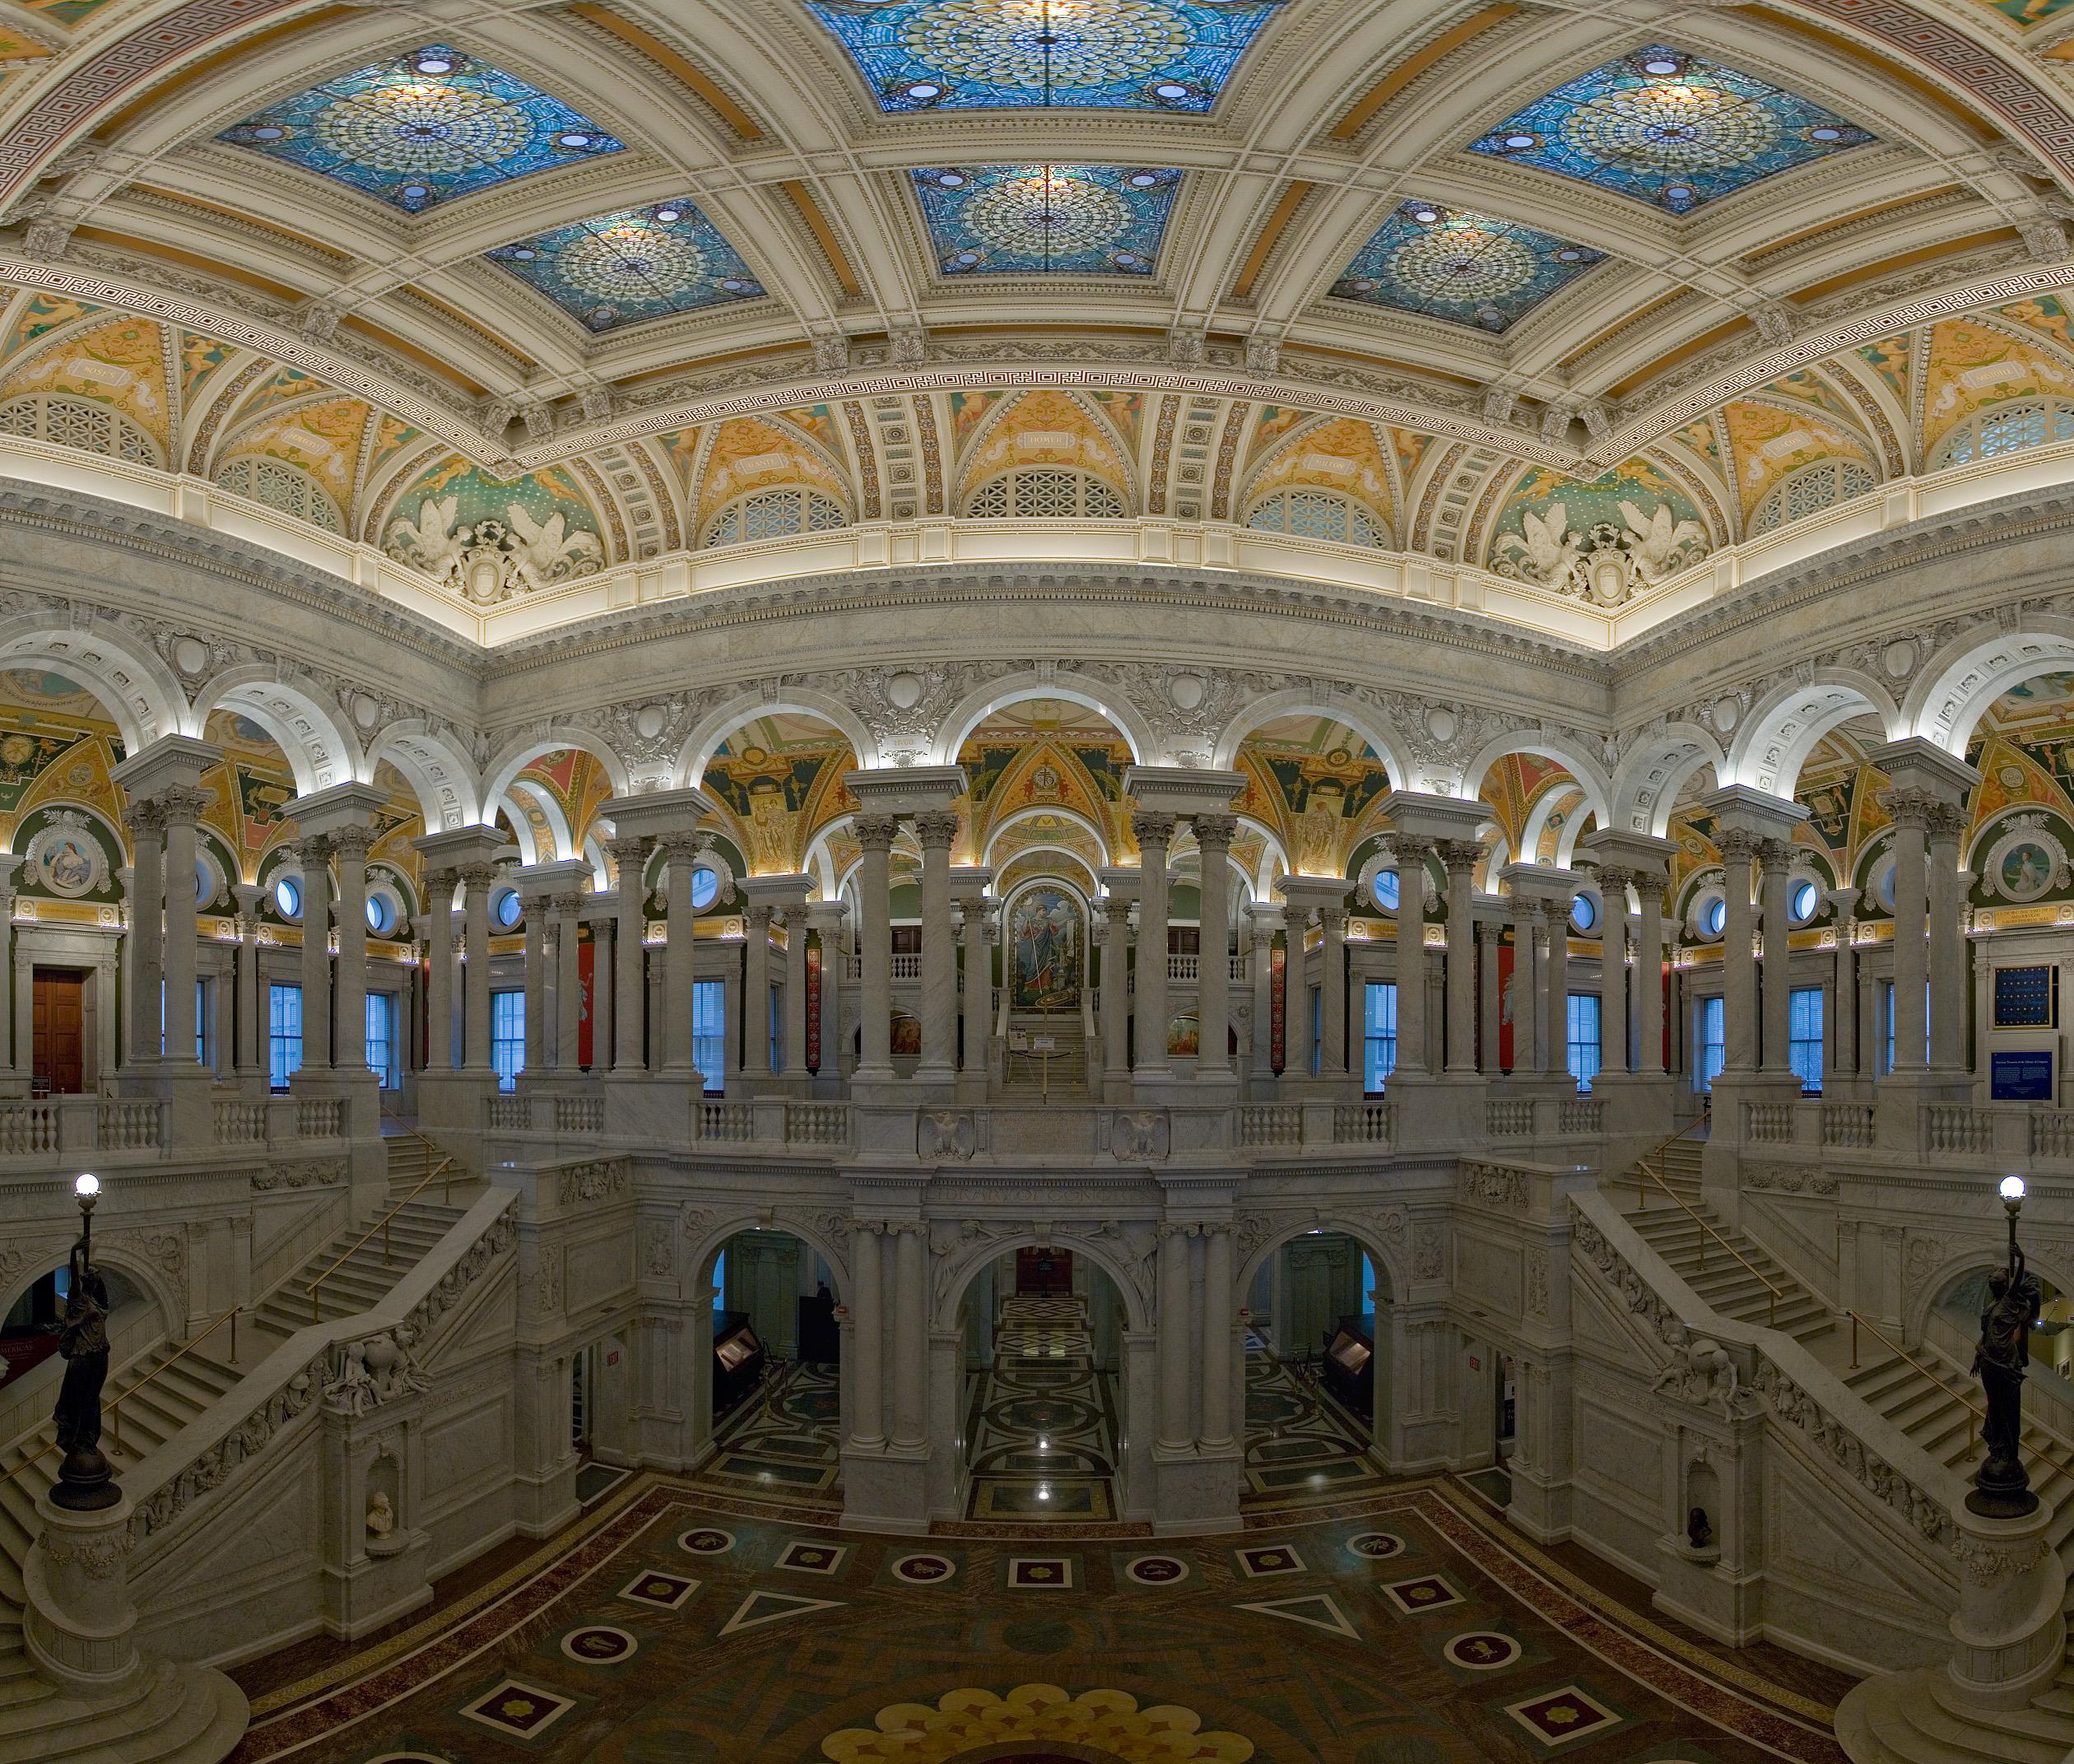 filelibrary of congress great hall jan 2006jpg wikipedia